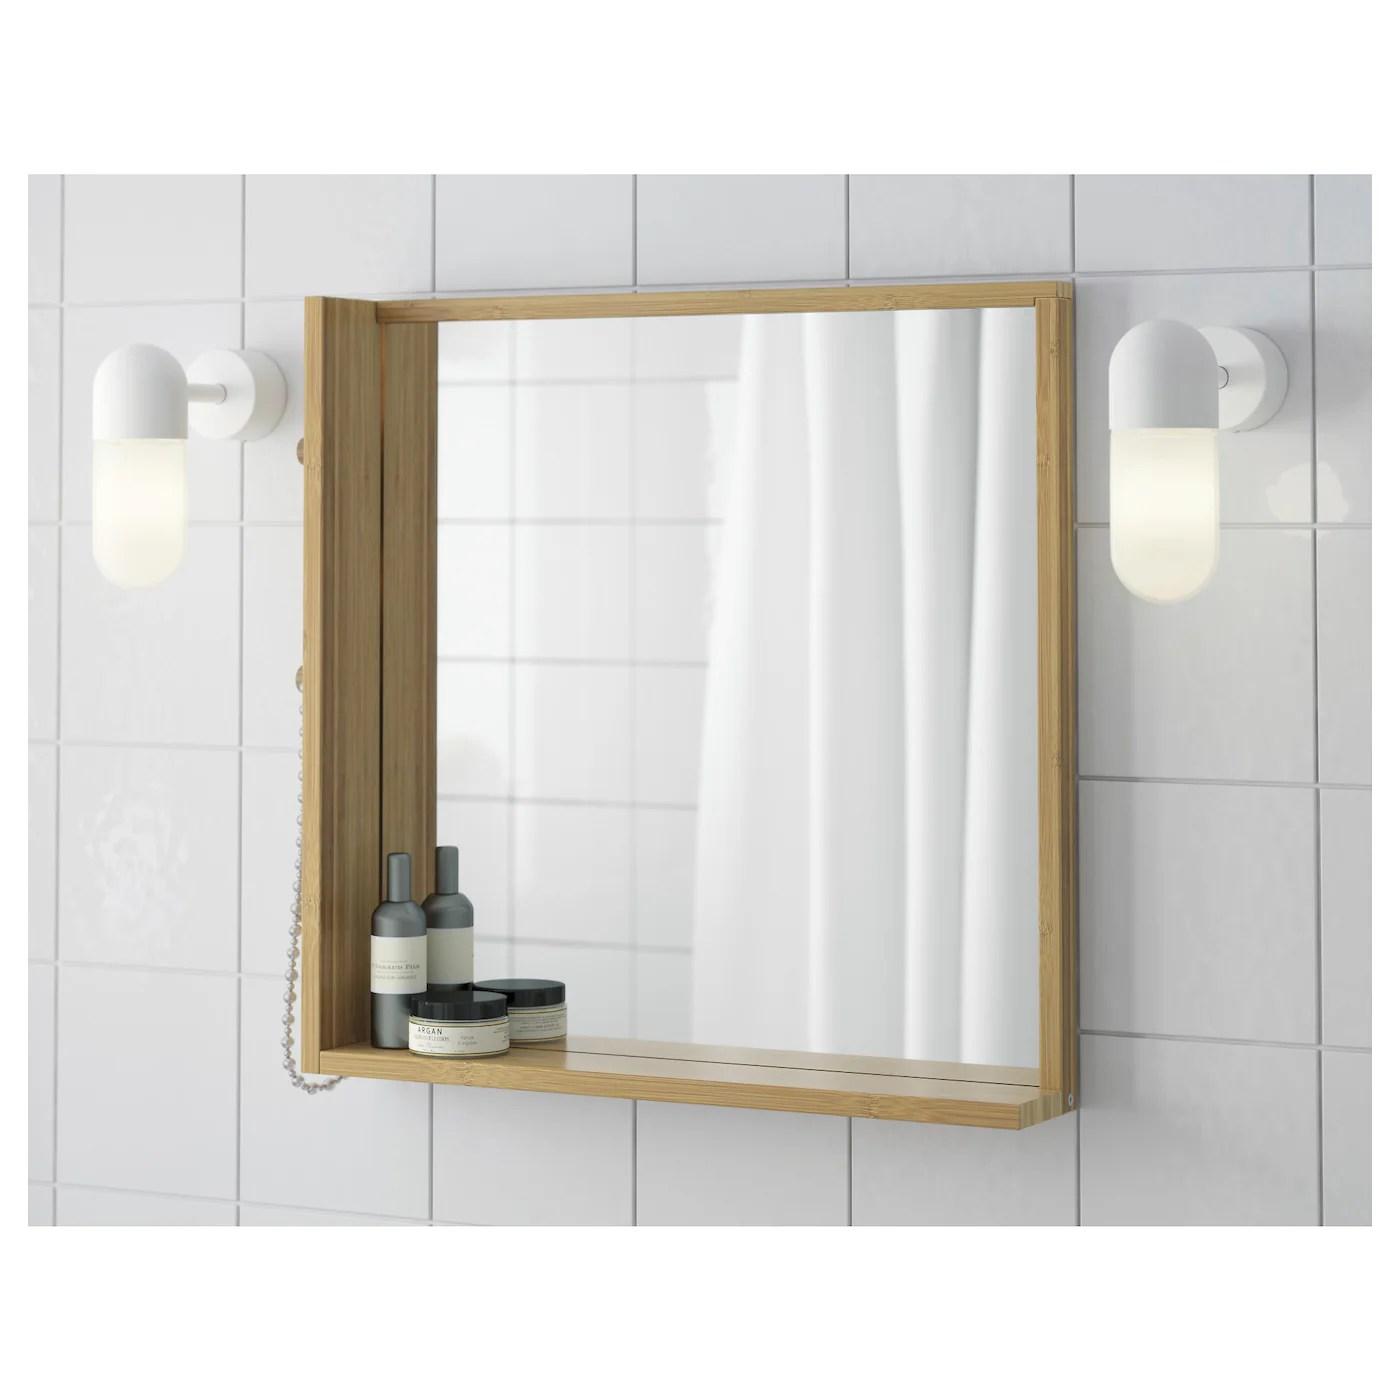 Ragrund Miroir Bambou 53x50 Cm Ikea